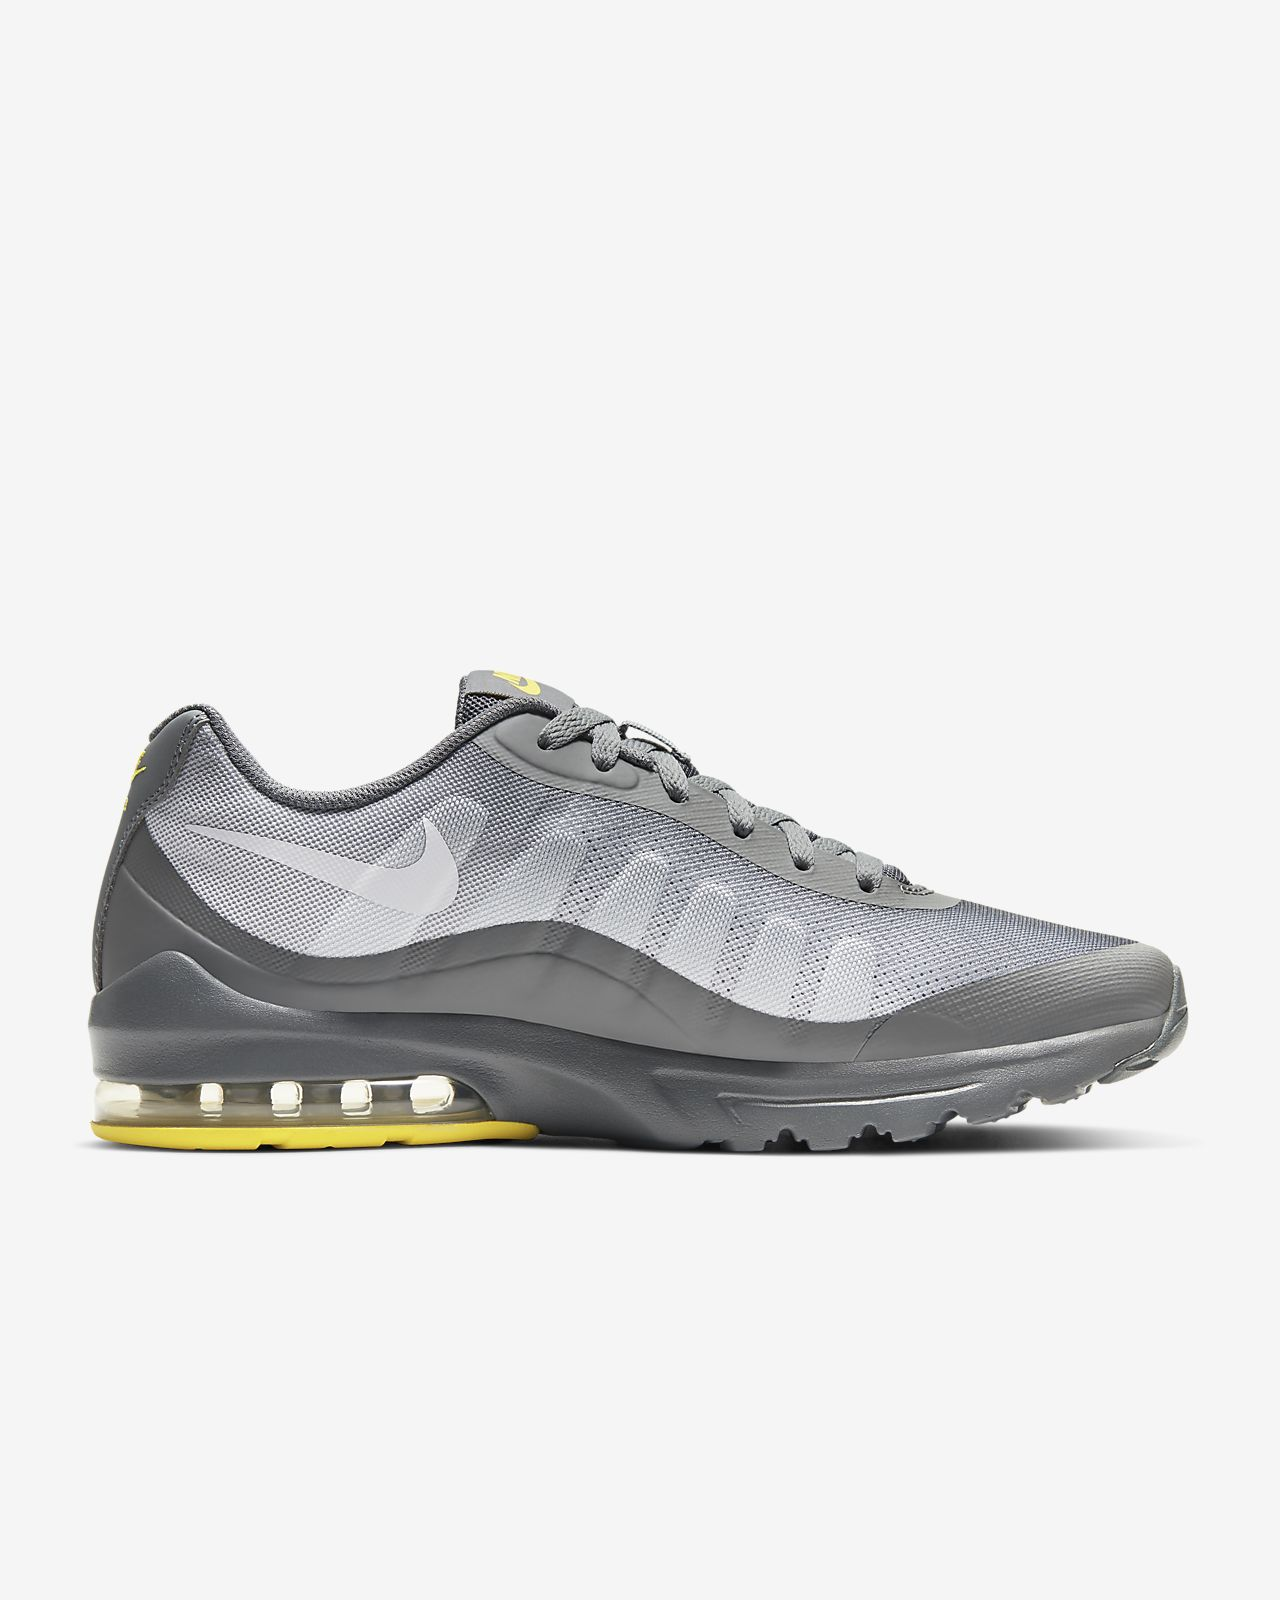 Acheter designer homme NIKE Chaussures Nike Air Max Invigor